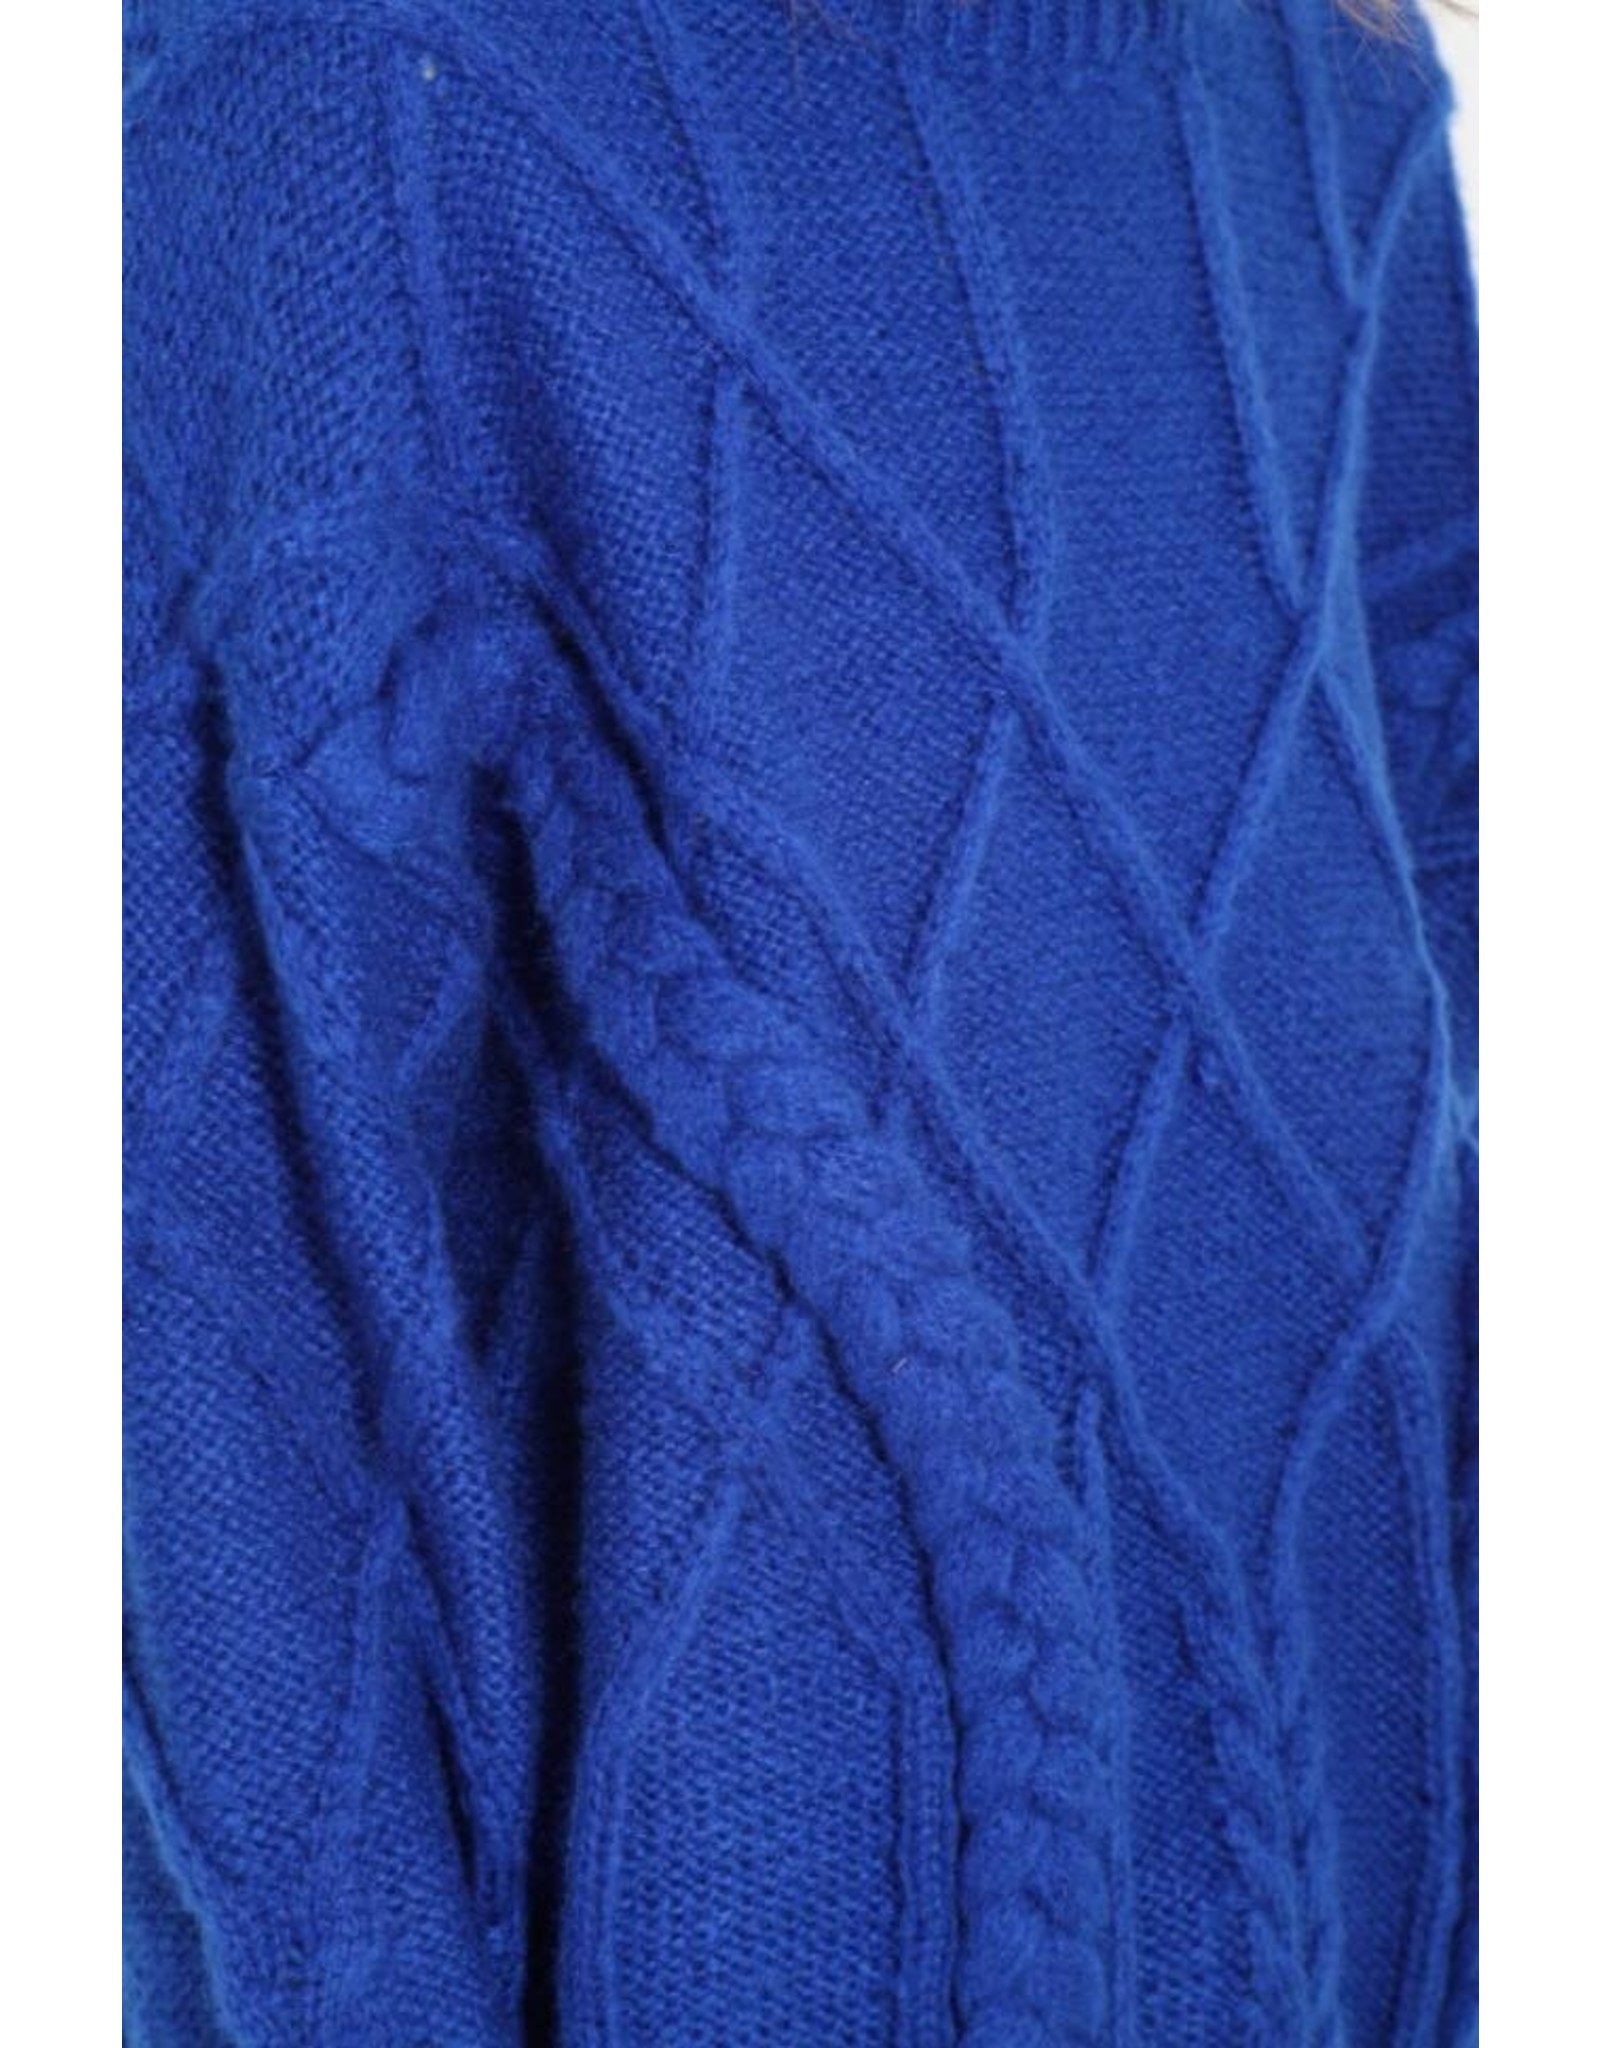 BRAIDED SWEATER COBALT BLUE